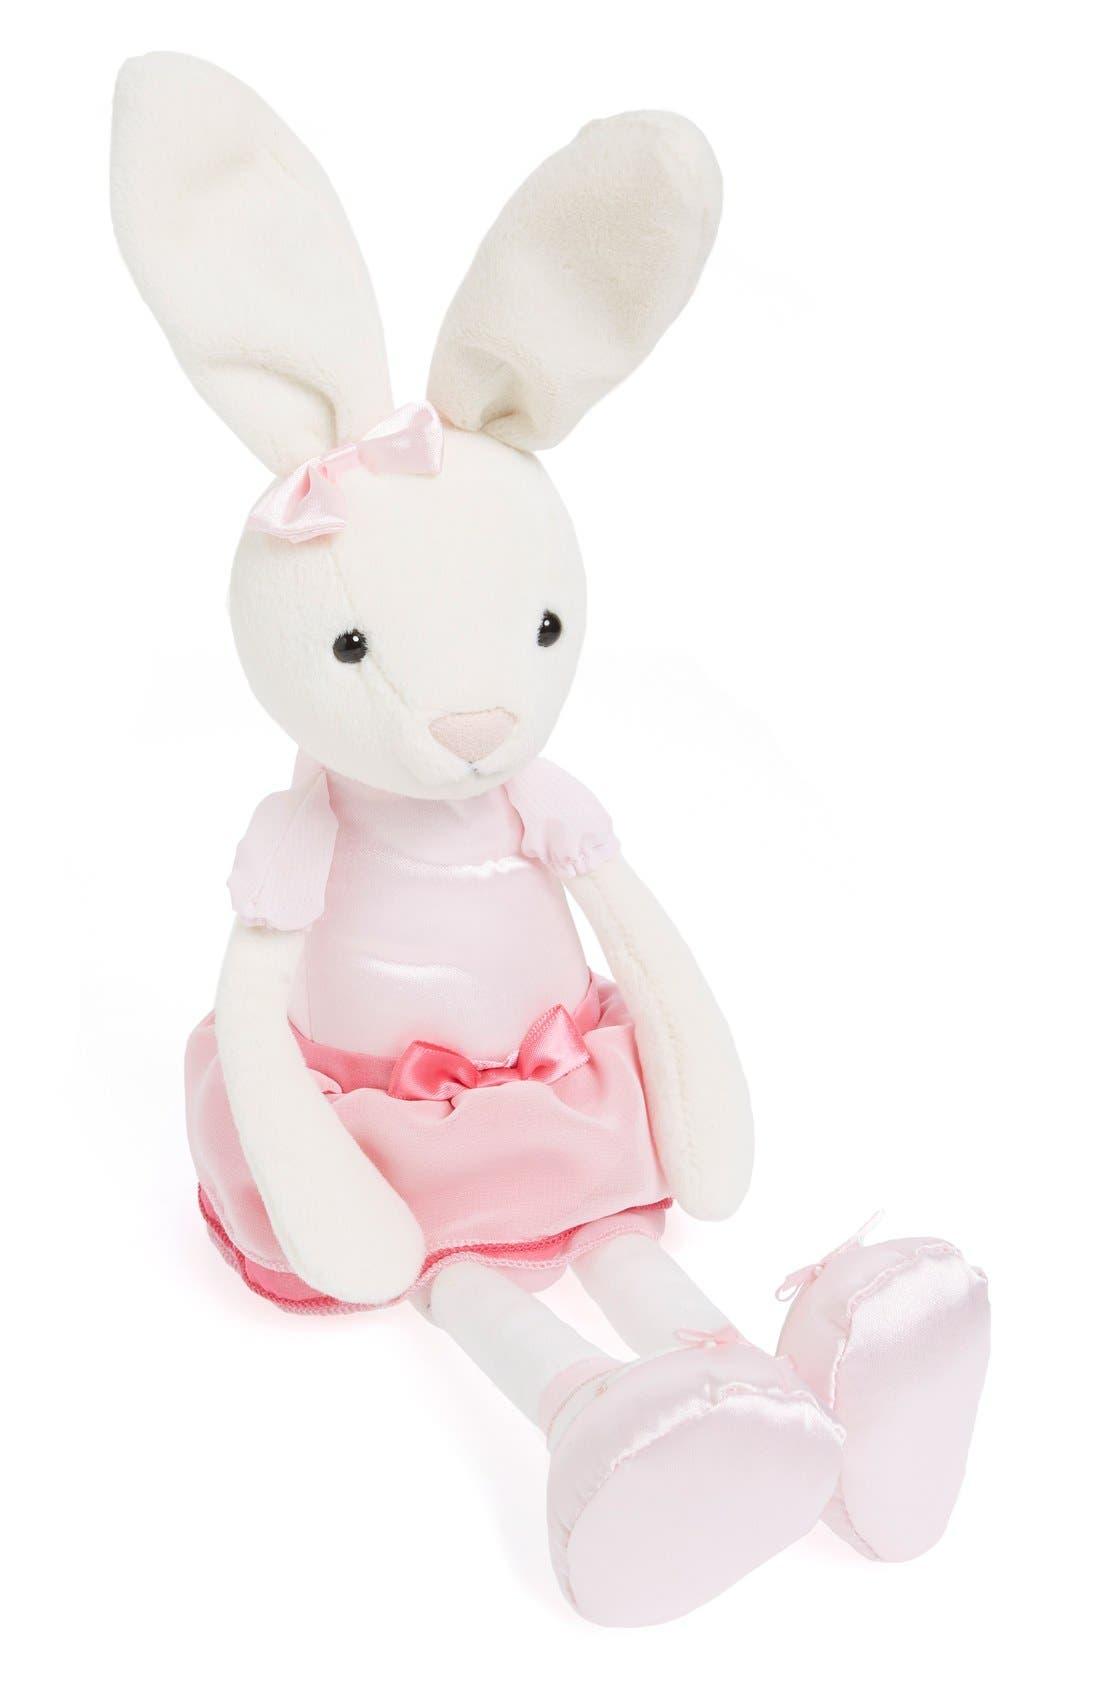 'Bitsy Ballerina Bunny' Stuffed Animal,                         Main,                         color, 660